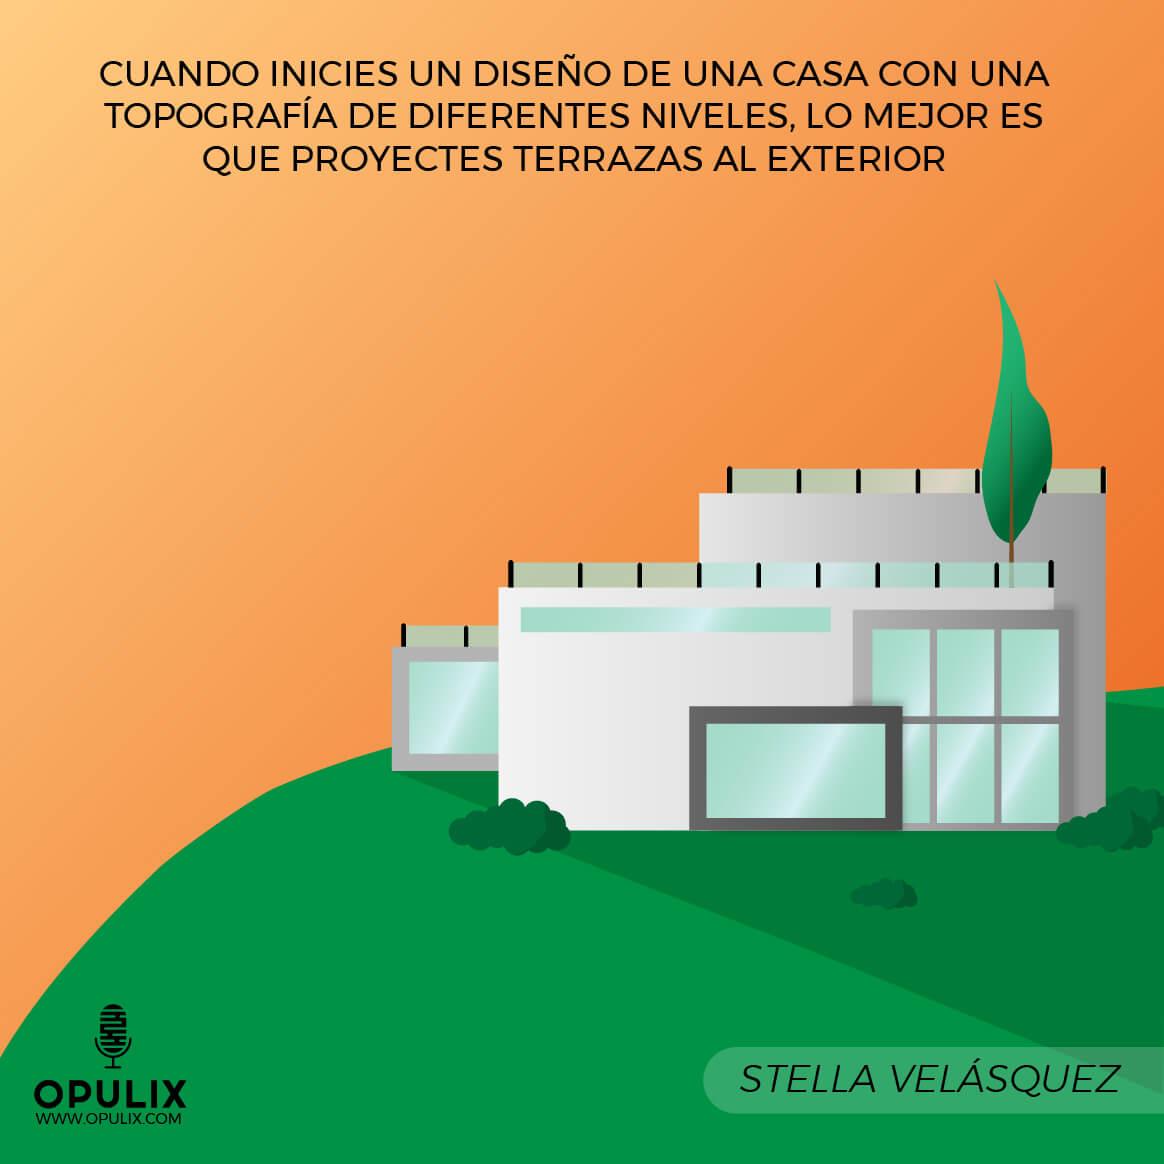 Modern House, Terraces, Different Levels, Design, Ideas